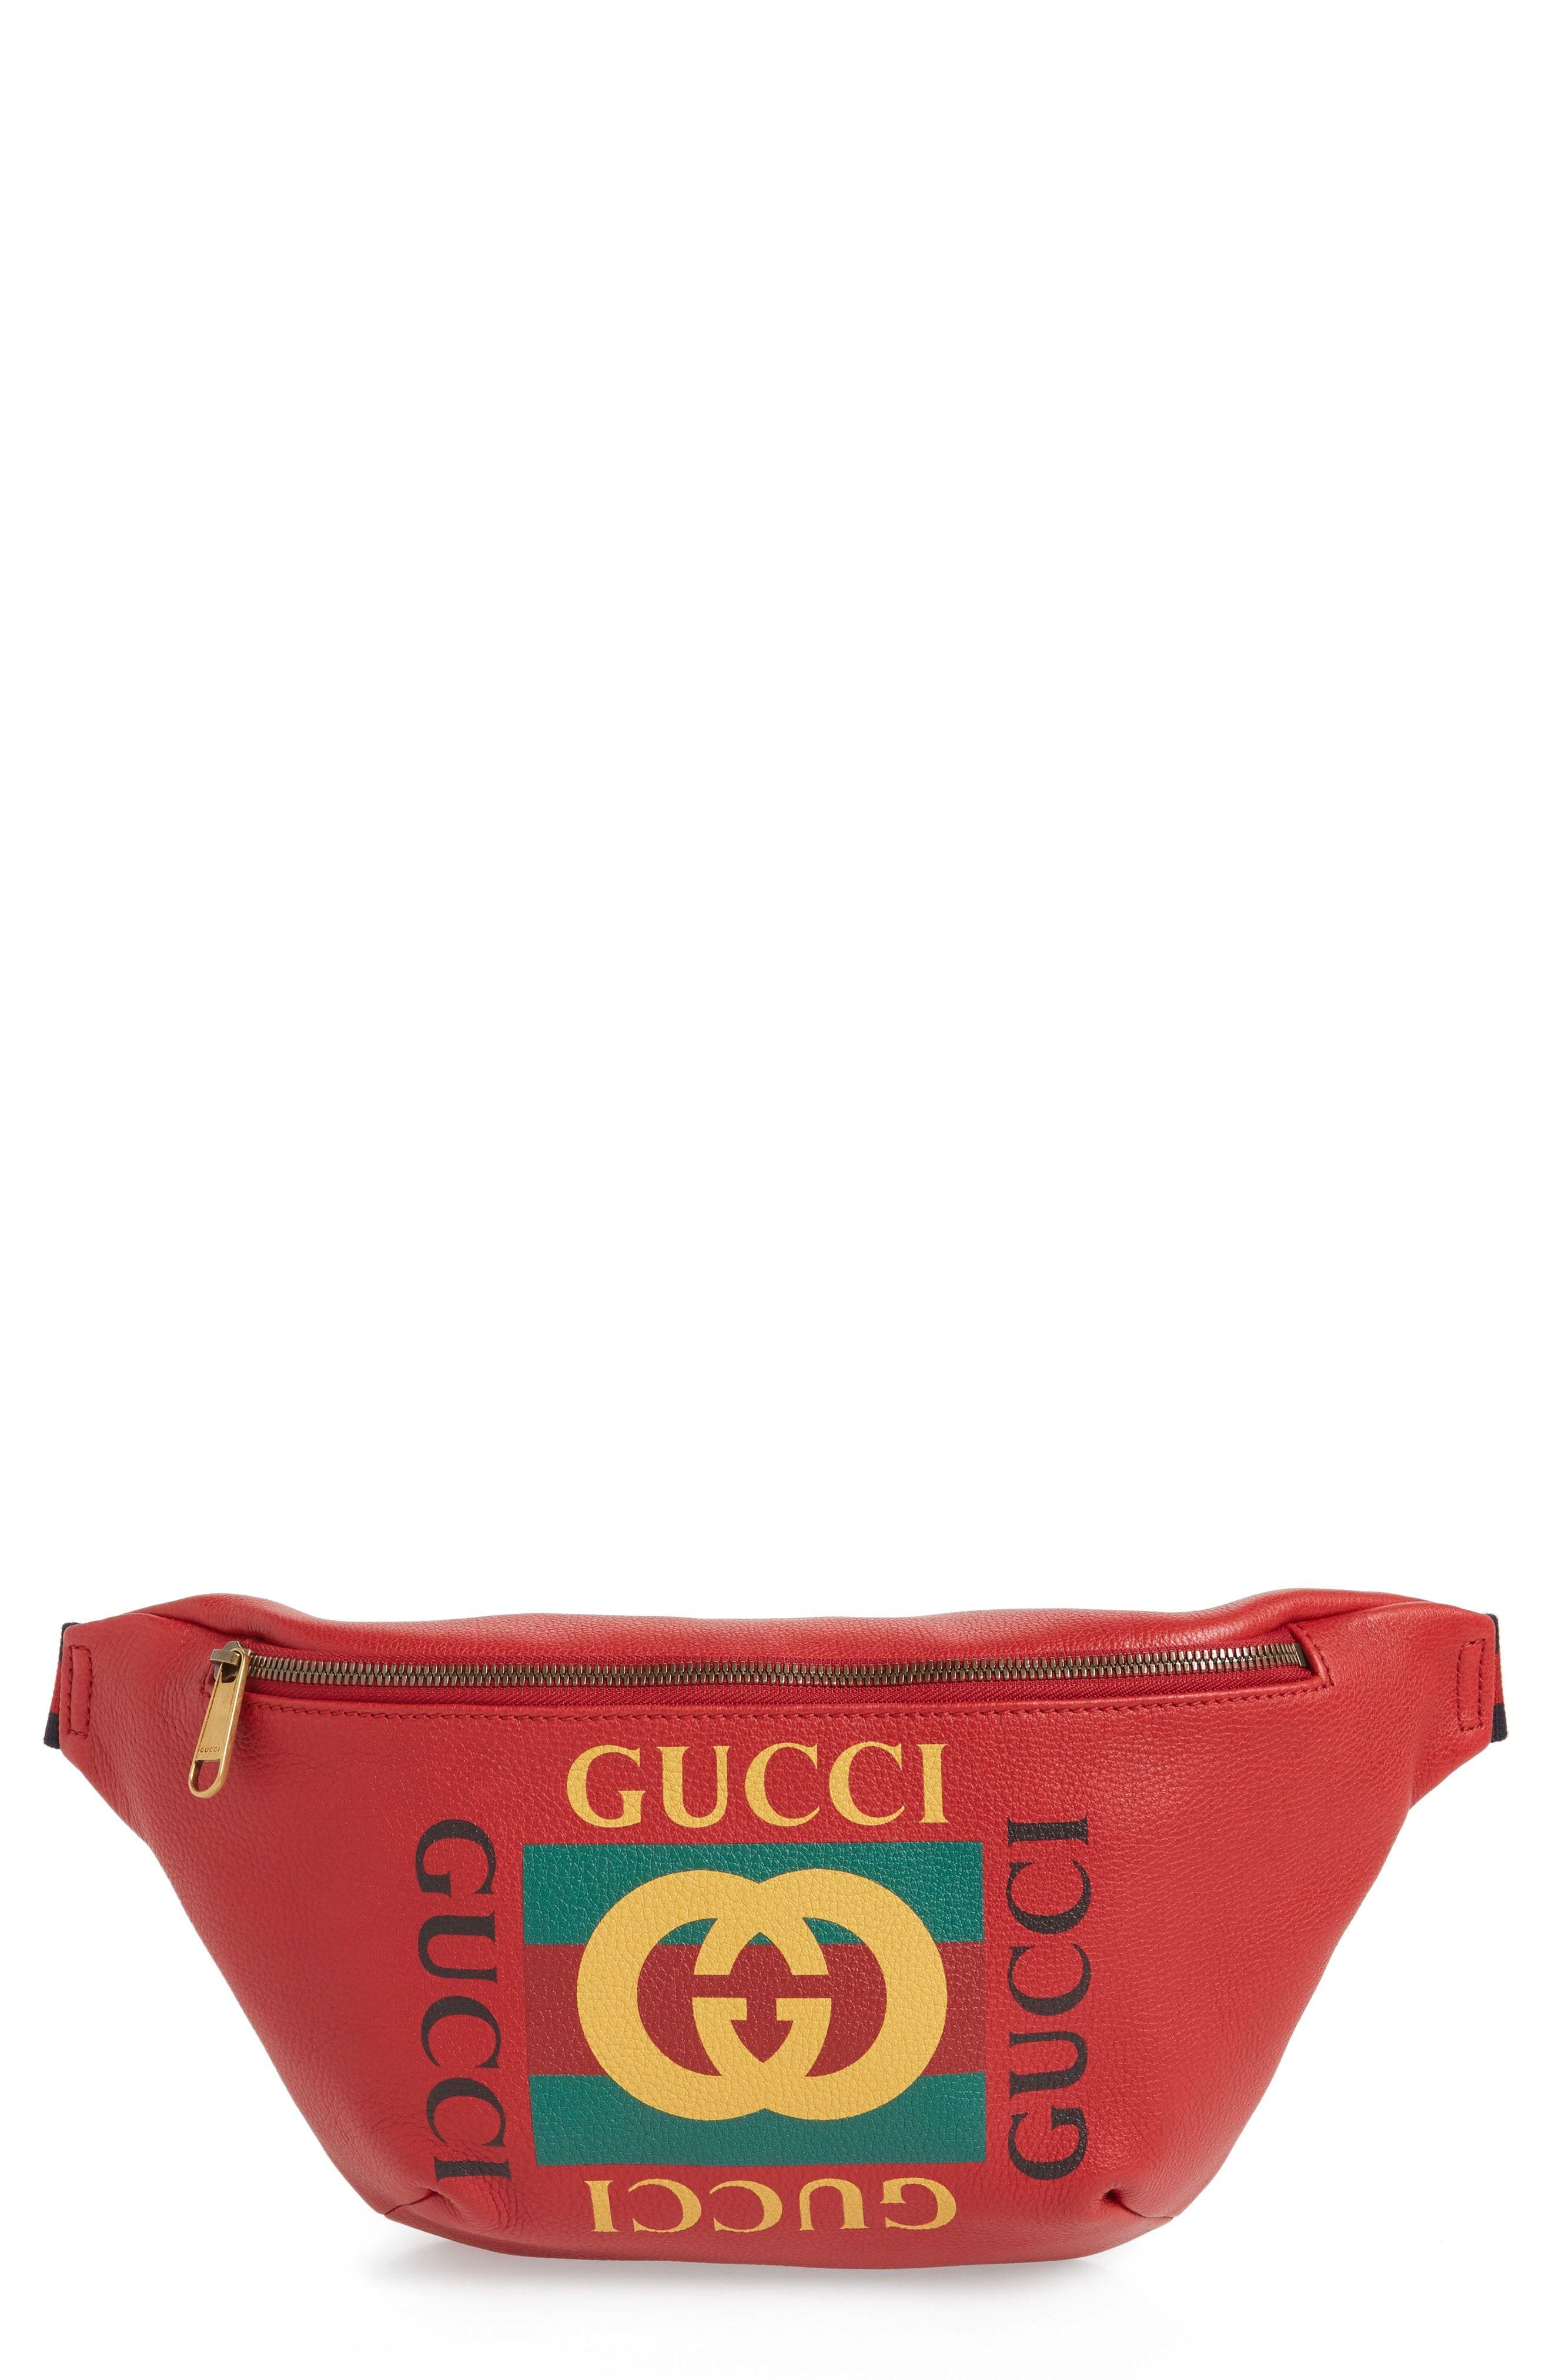 0ffdd99cc7b2b8 GUCCI FAKE LOGO WAIST PACK - RED. #gucci #bags #leather #belt bags ...